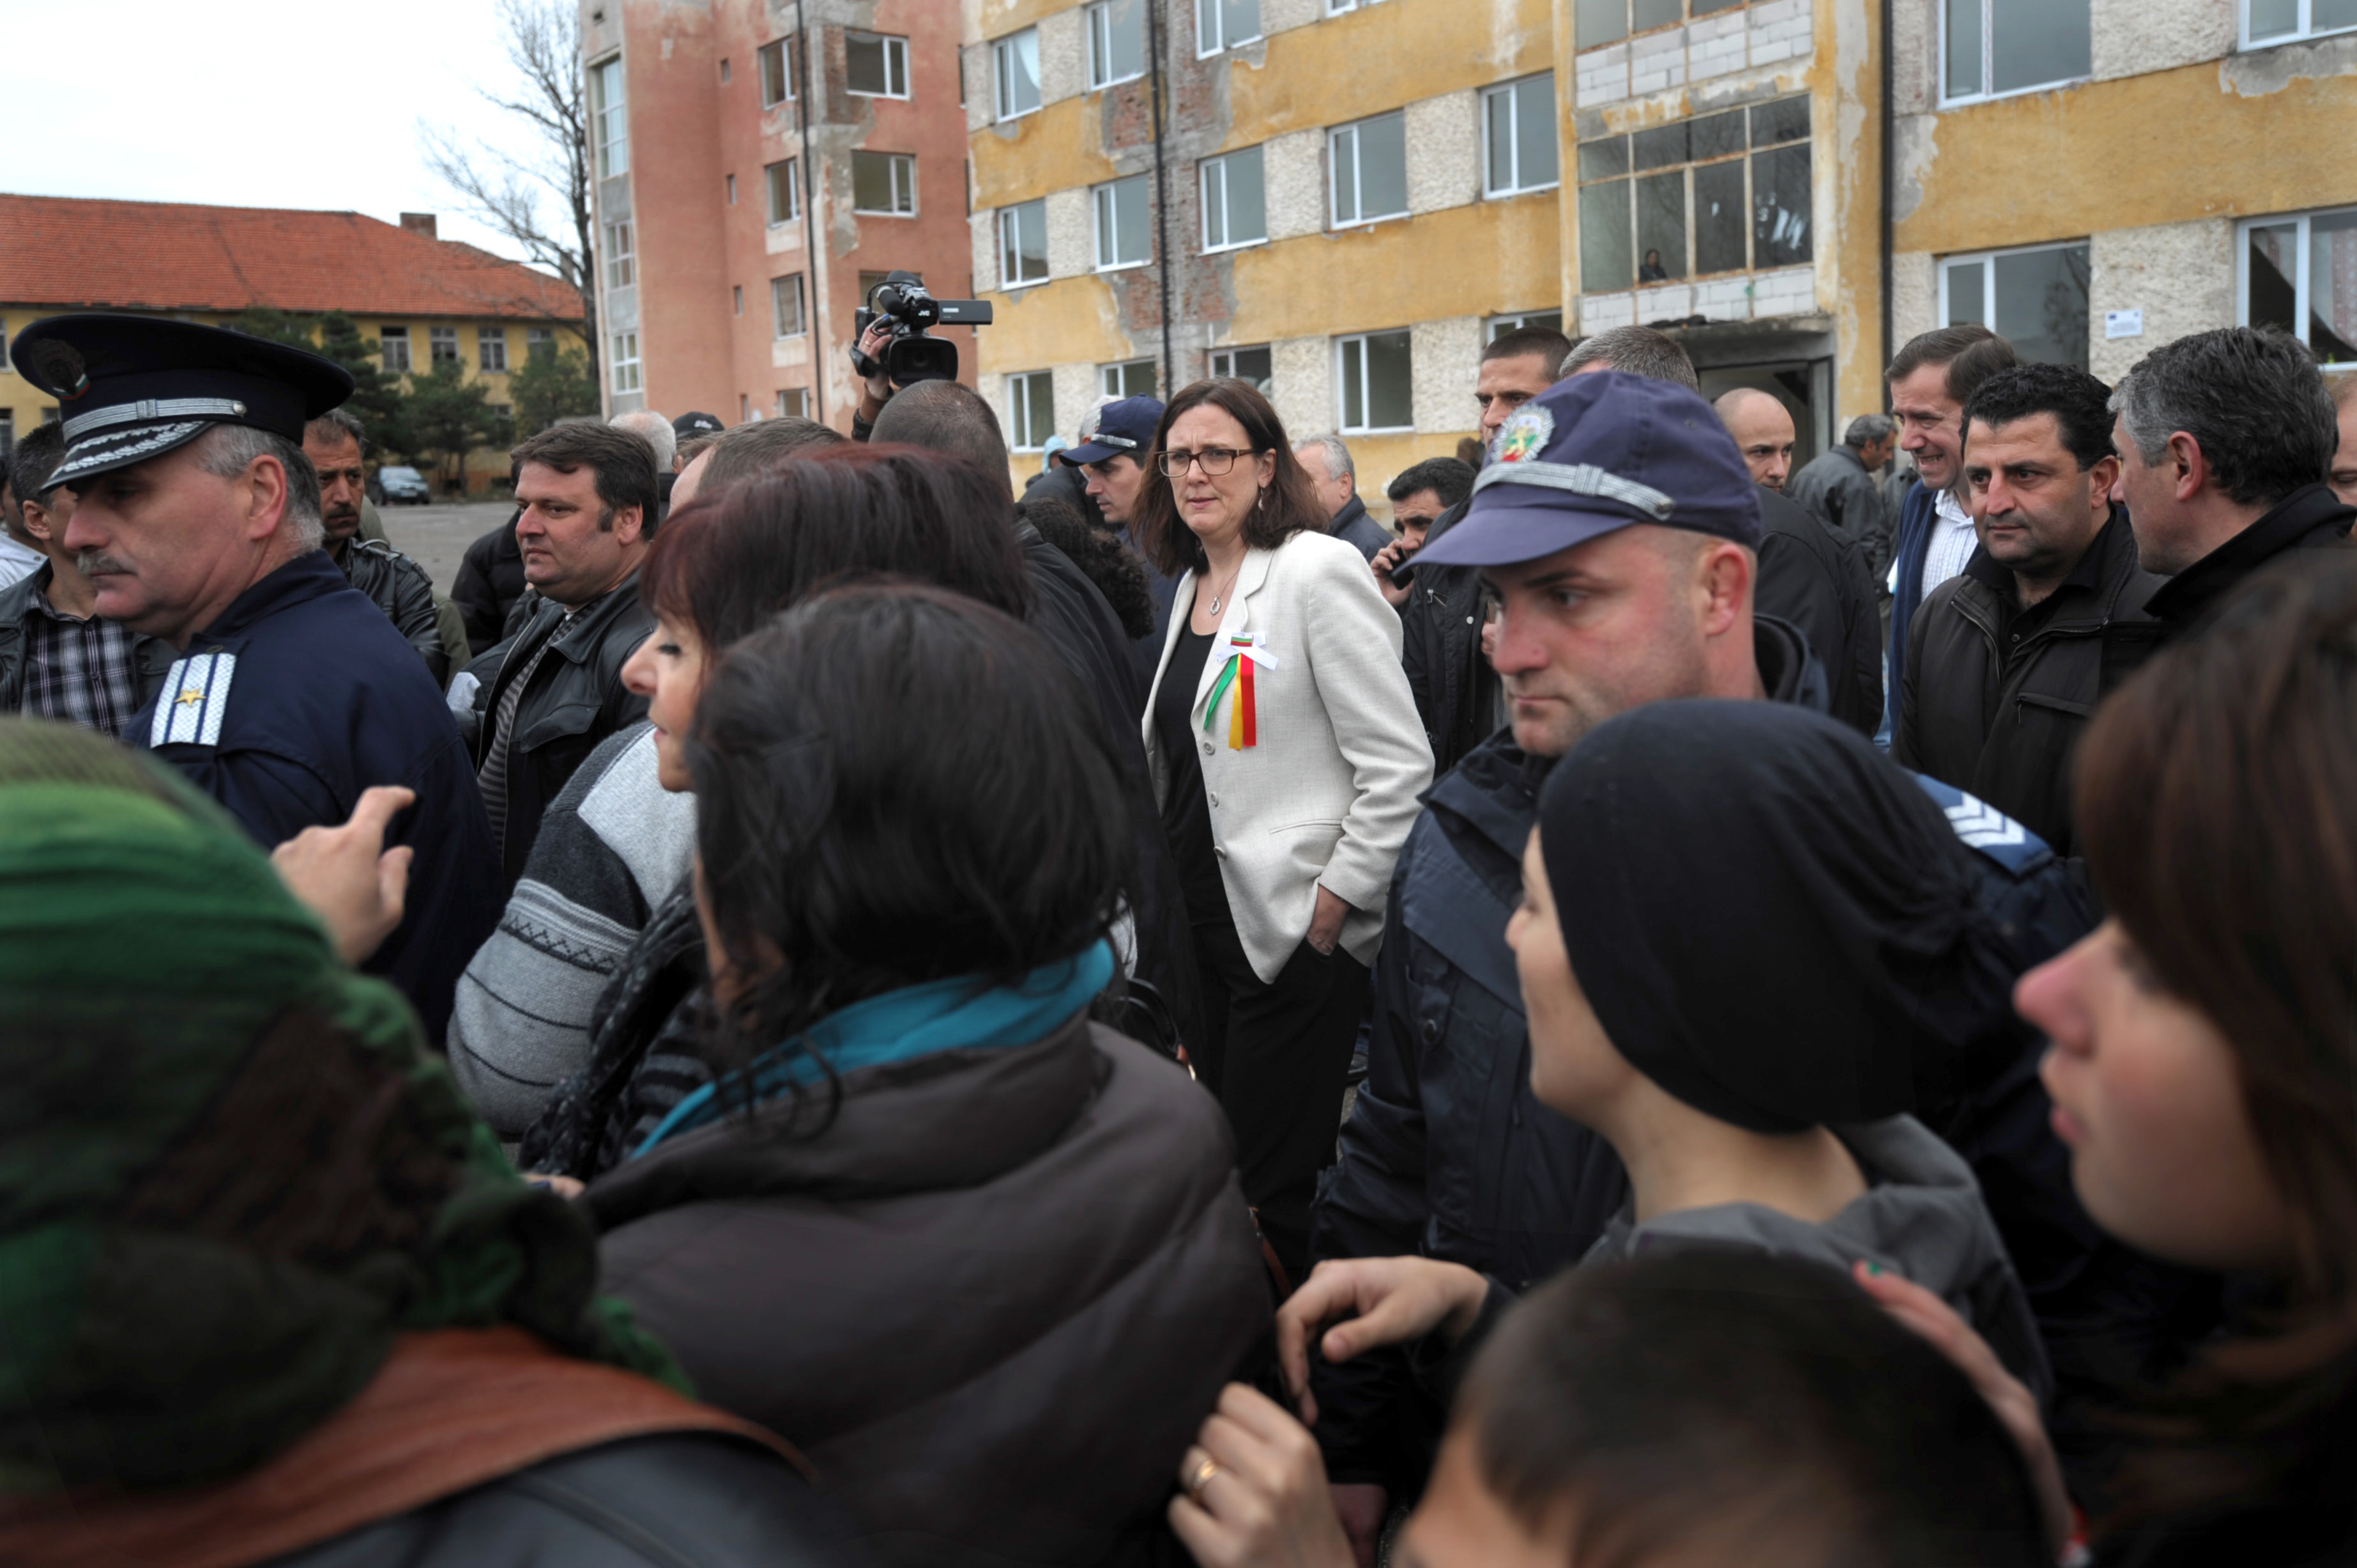 Refugees put demands as European Commissioner Malmström visits Bulgaria's Harmanli shelter